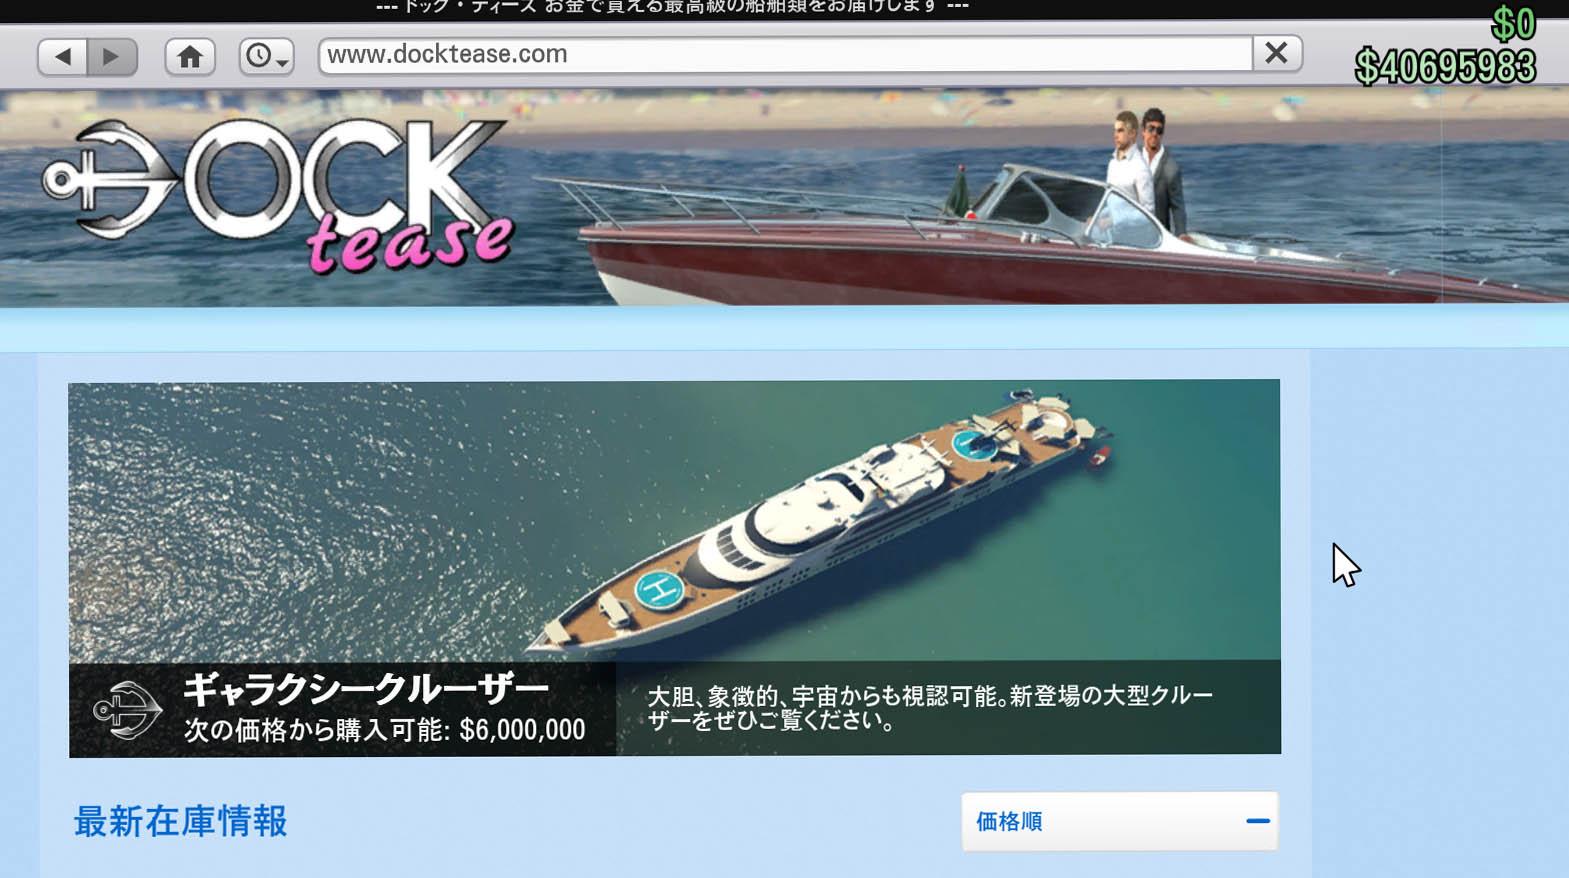 www.docktease.comのサイト